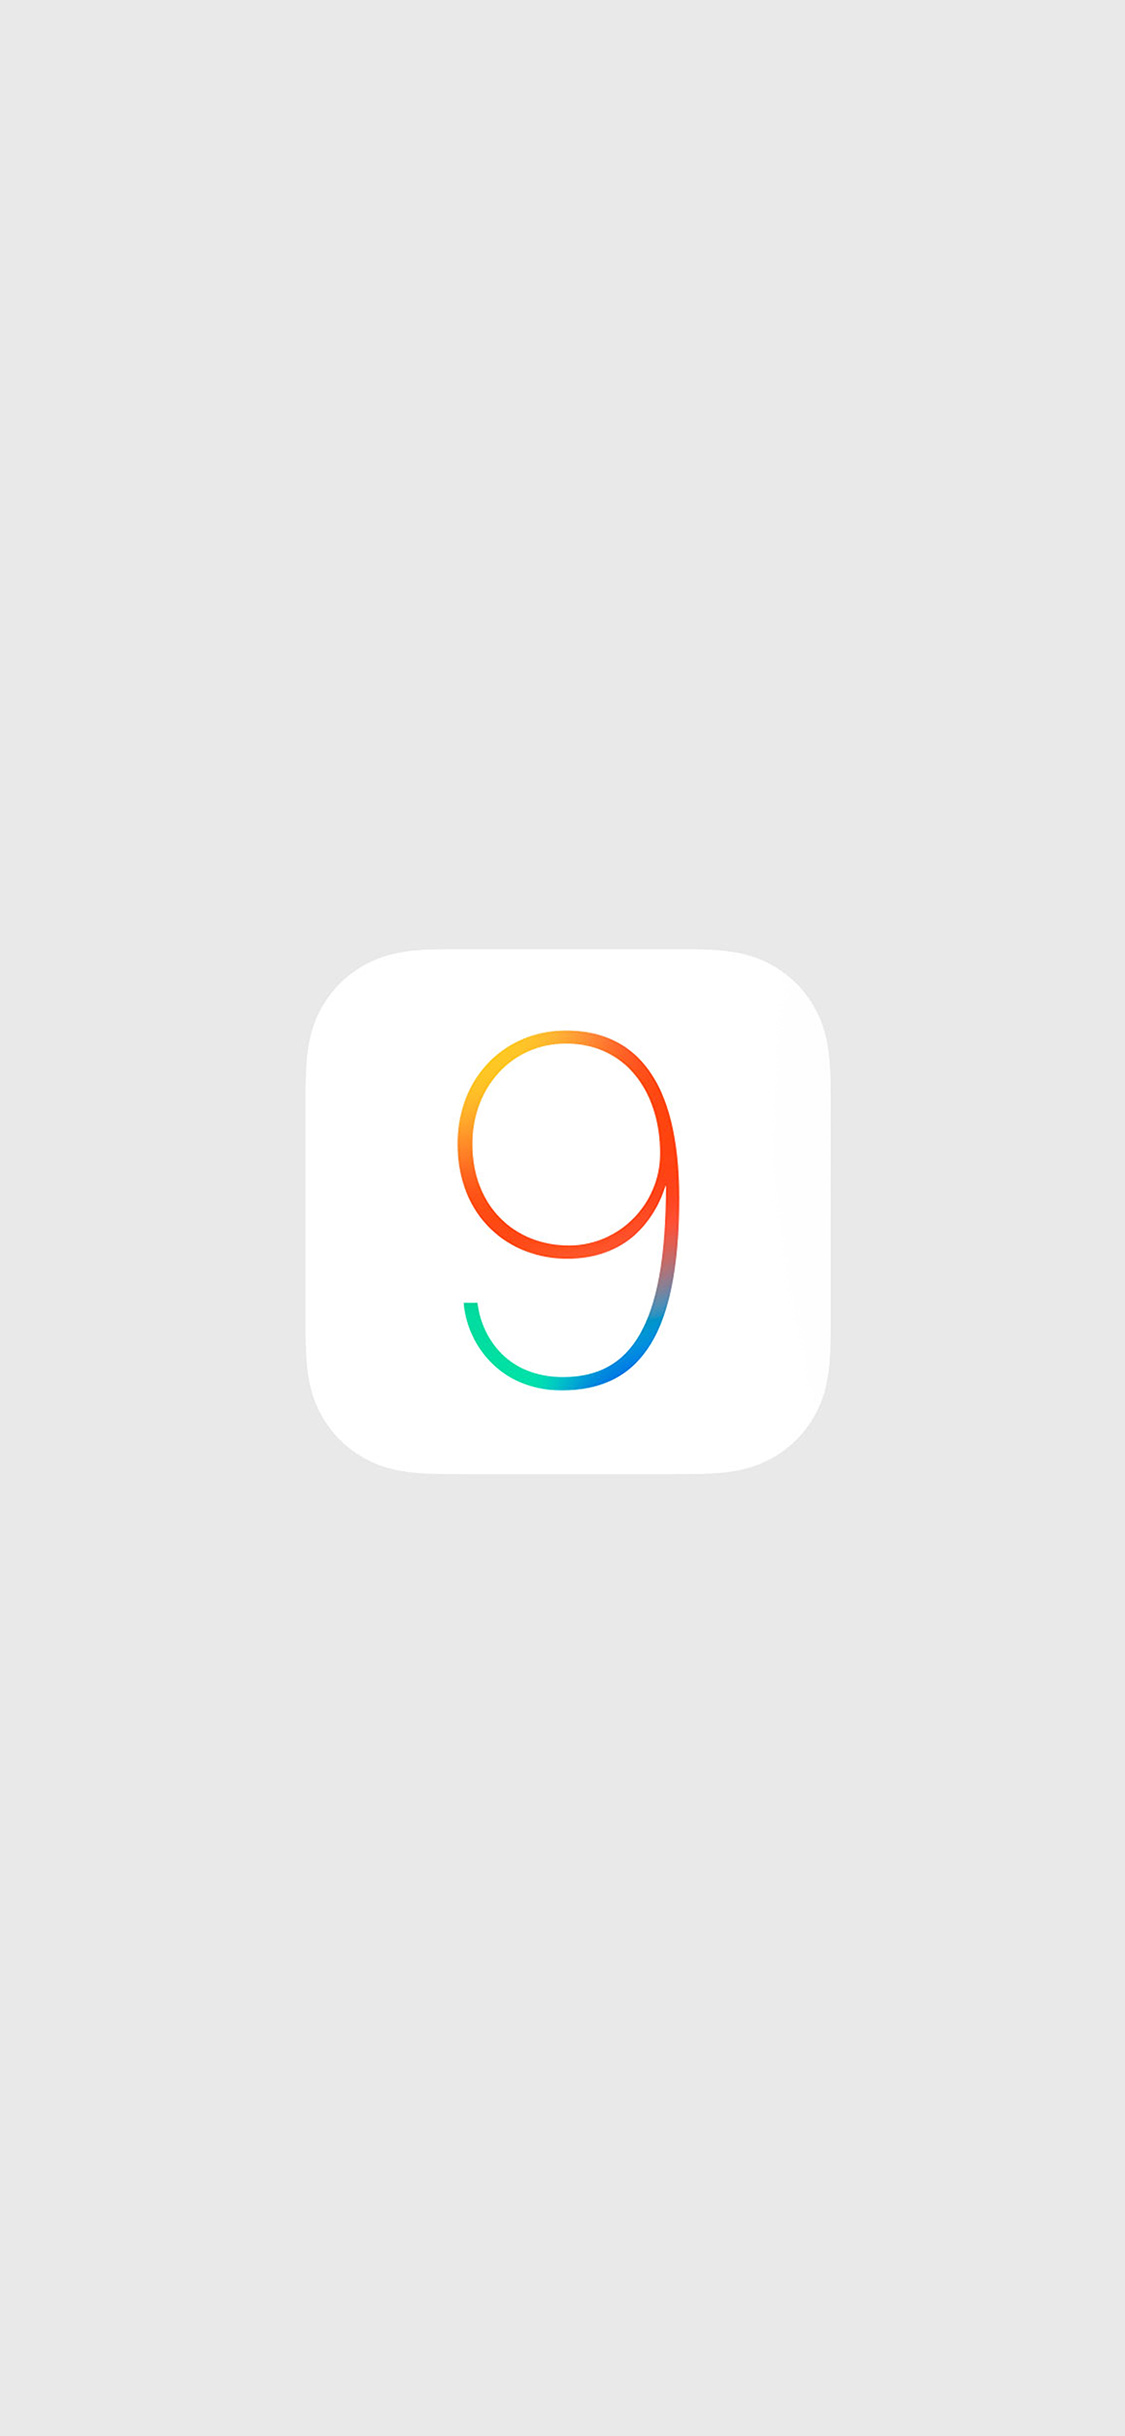 iPhoneXpapers.com-Apple-iPhone-wallpaper-am64-ios9-logo-apple-new-minimal-gray-simple-art